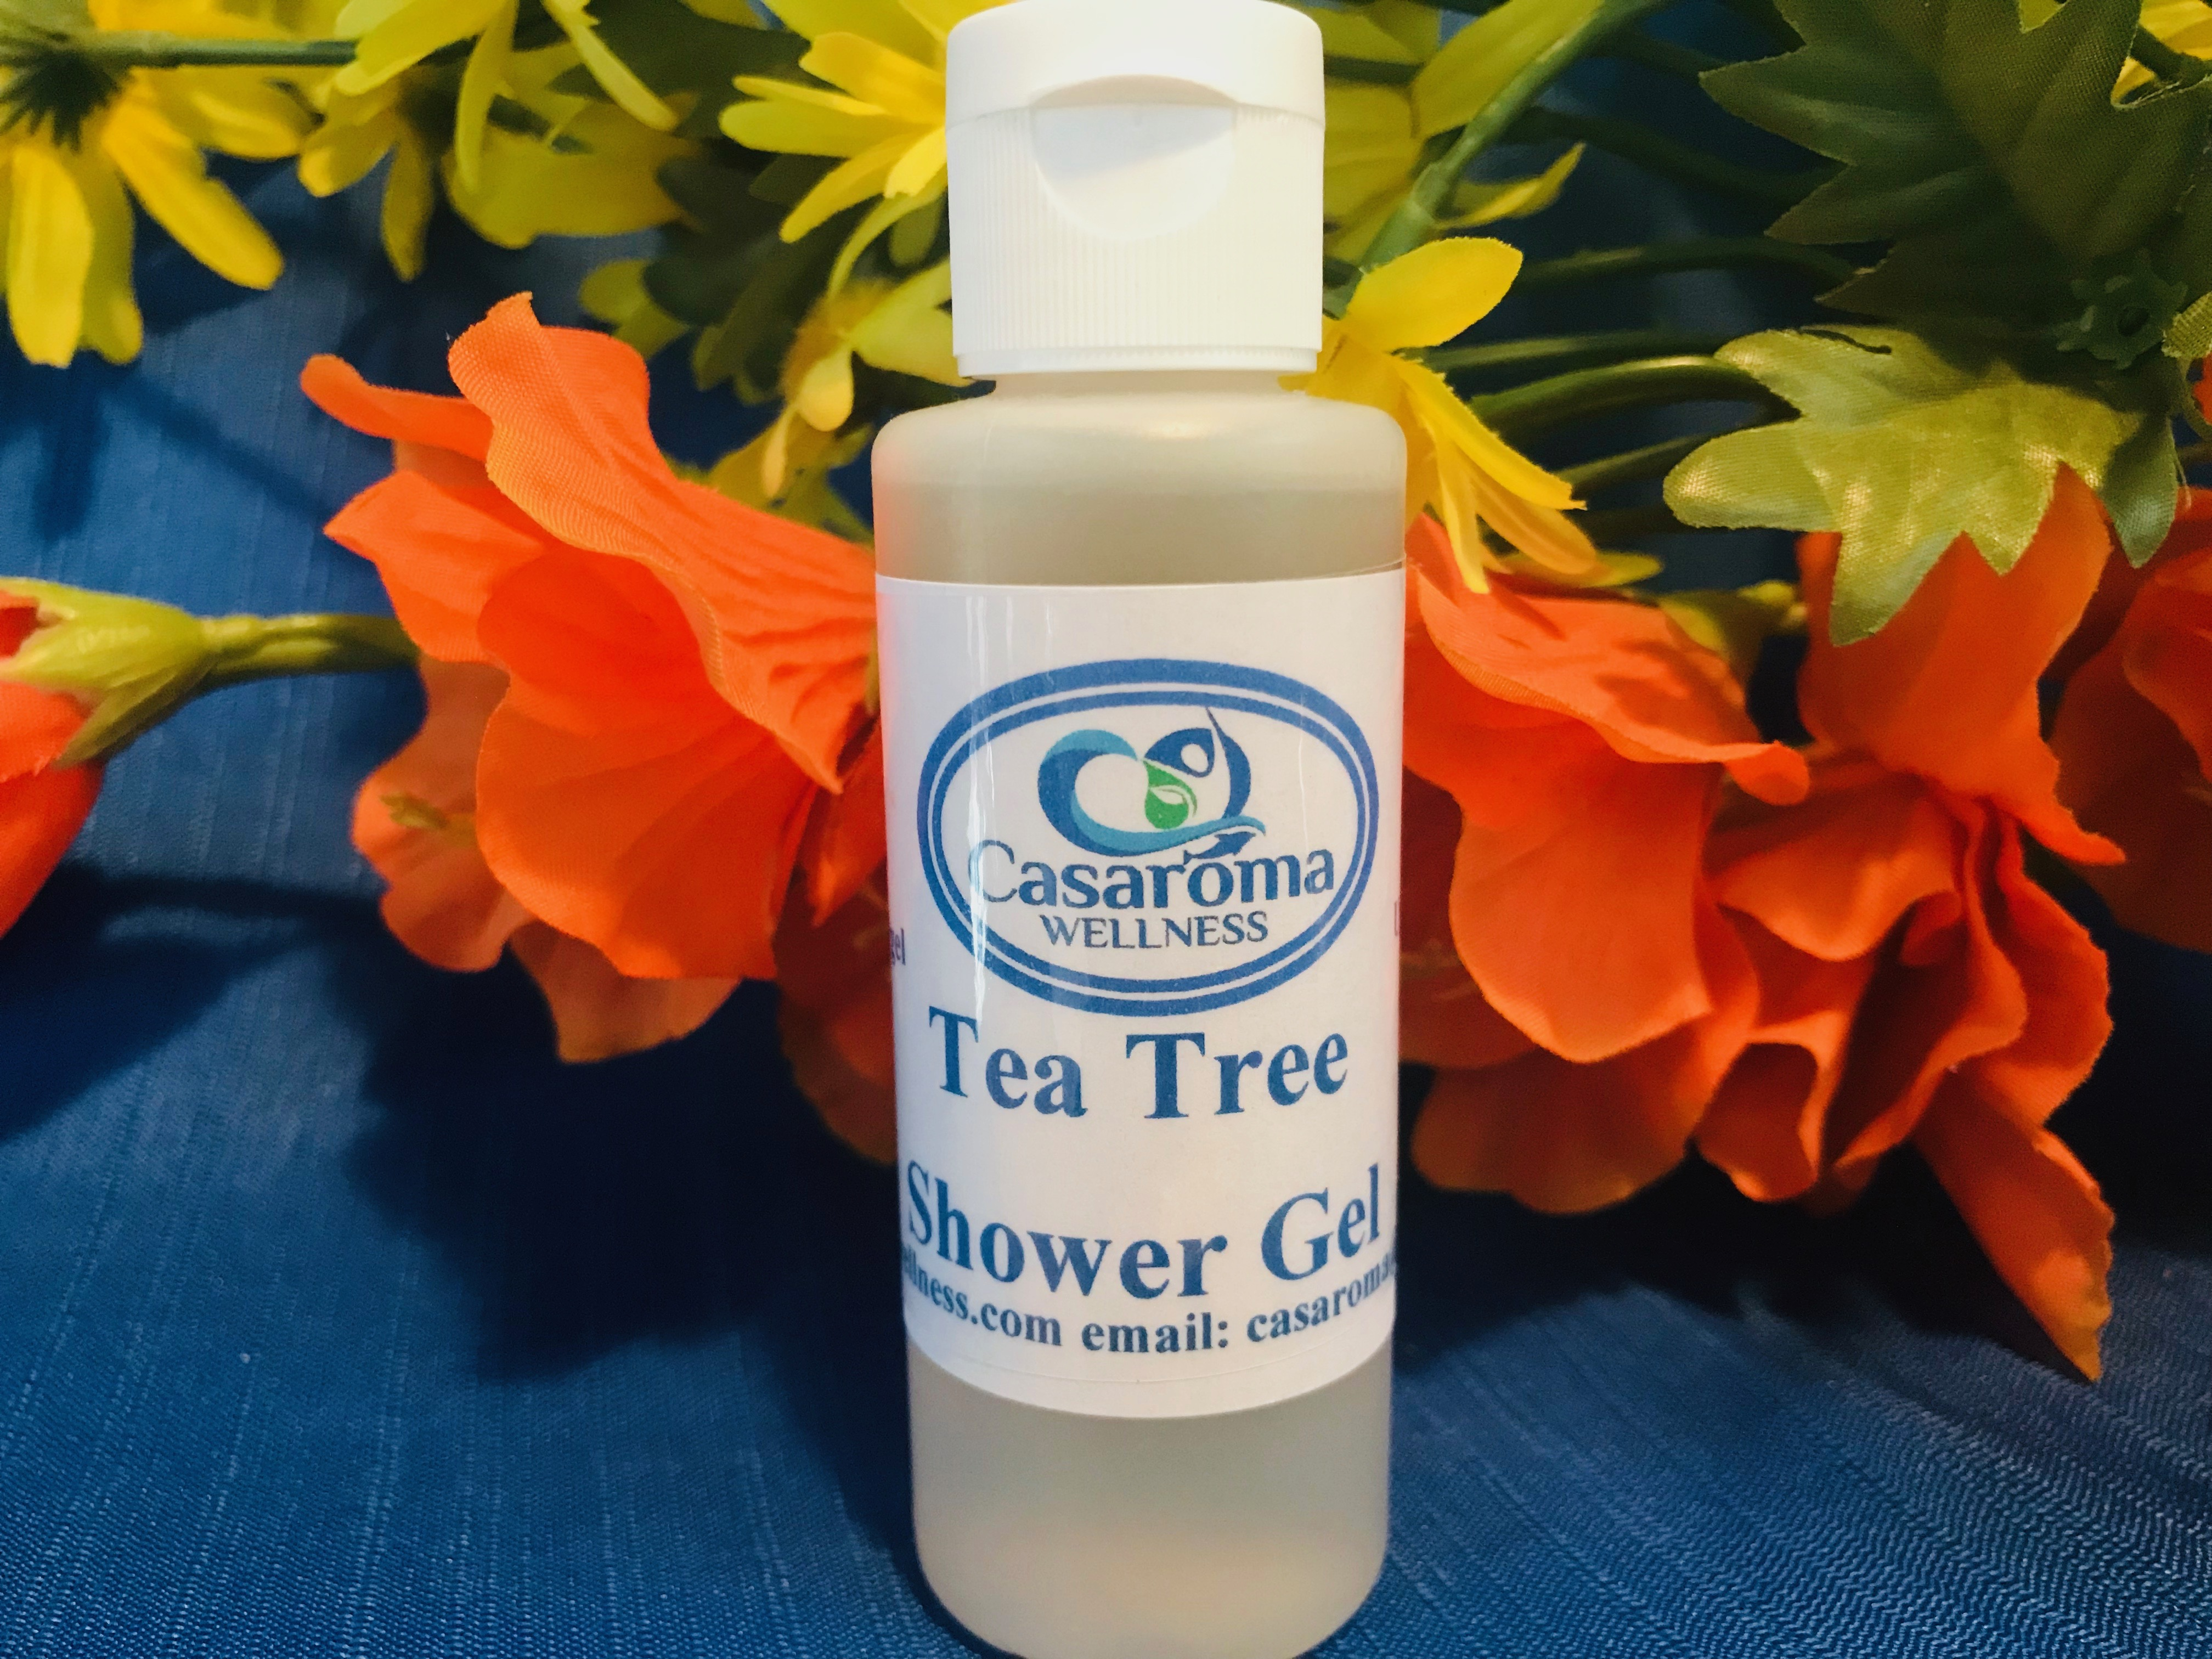 Tea Tree Shower Gel